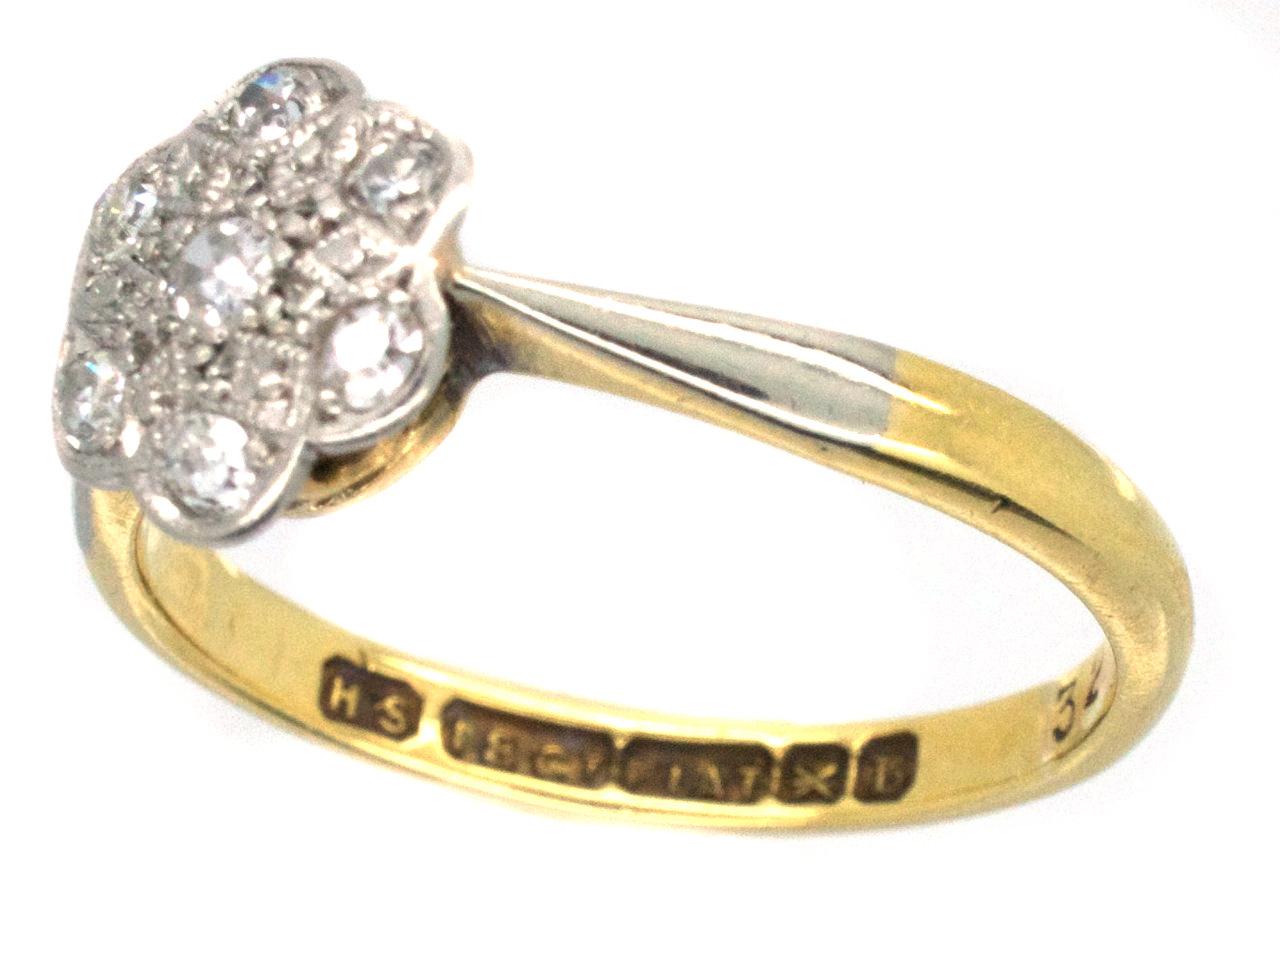 Edwardian 18ct Gold & Platinum Diamond Set Daisy Ring